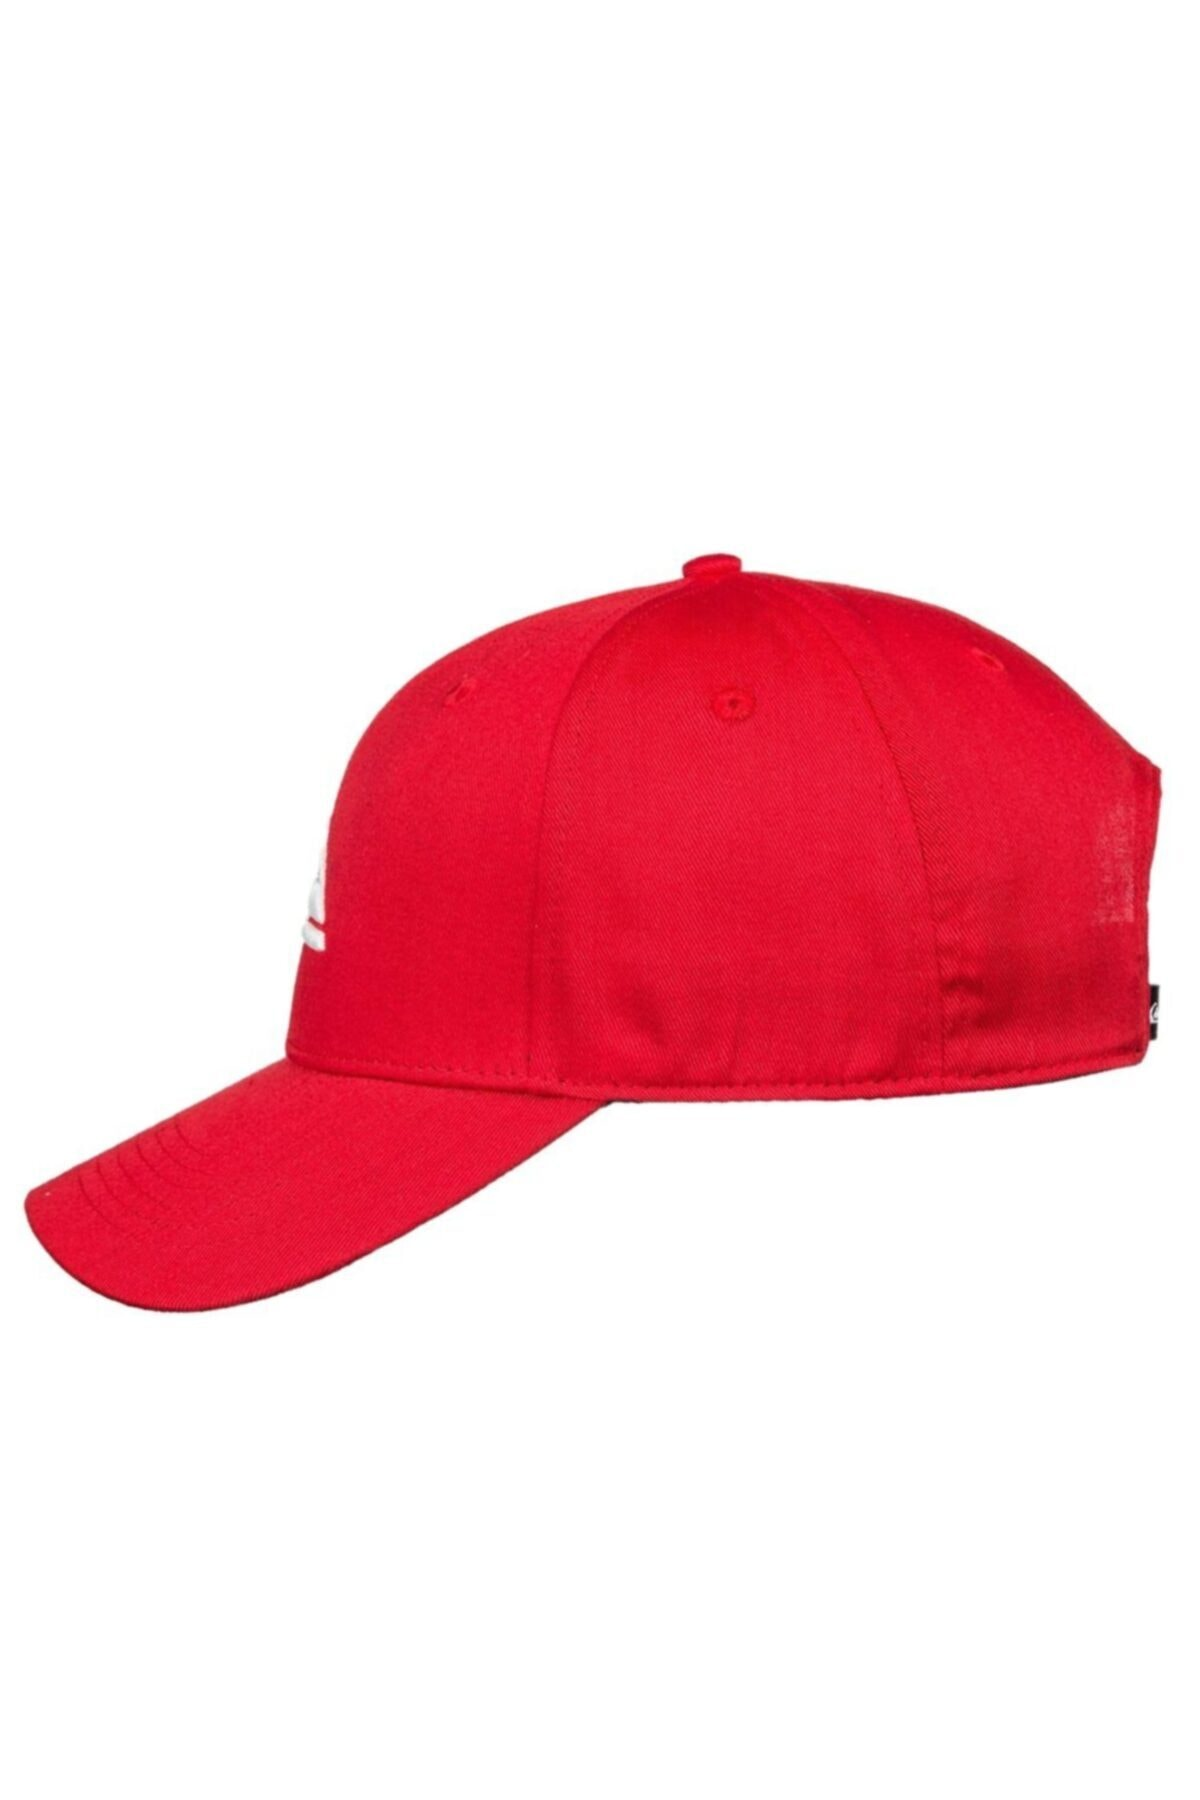 Quiksilver Decades Snapback Hdwr Mnl0 Şapka 2